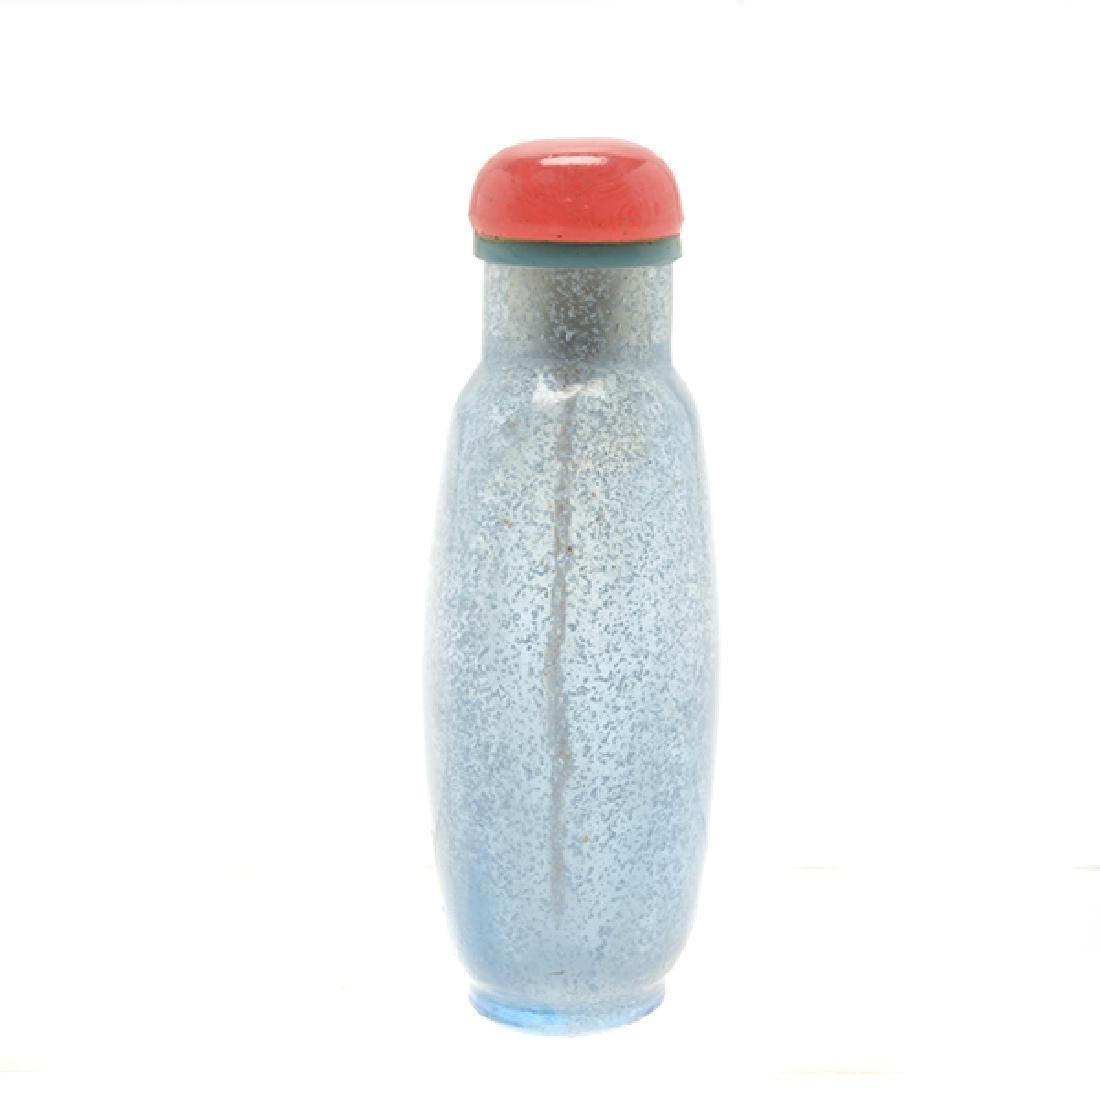 2 Monochromatic Glass Snuff Bottles, 19th C - 10